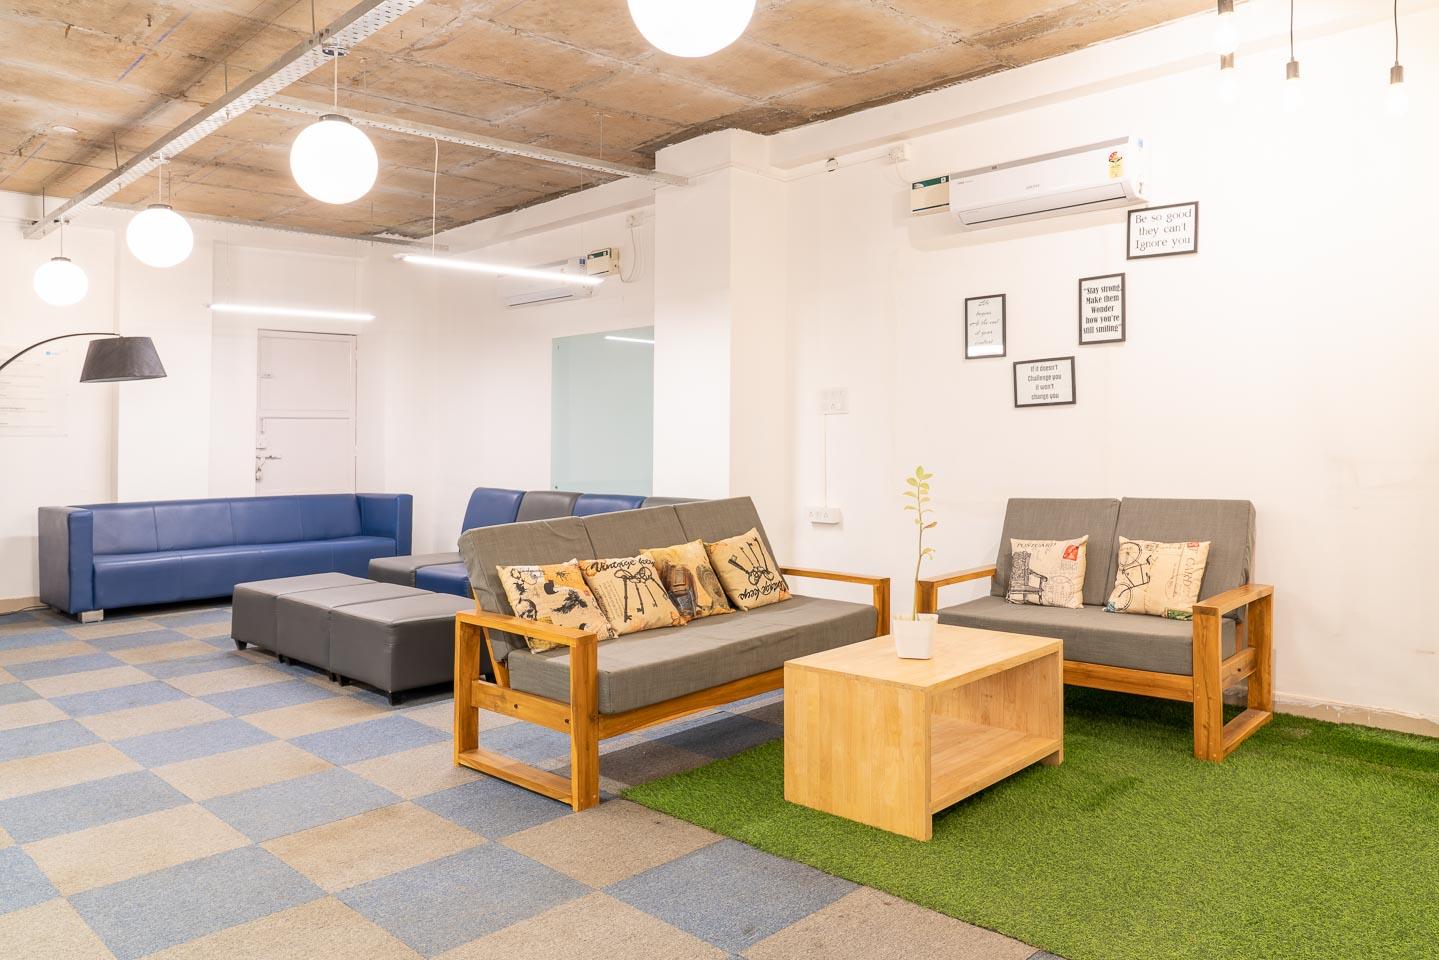 Coworking space in Koramangala, Bangalore